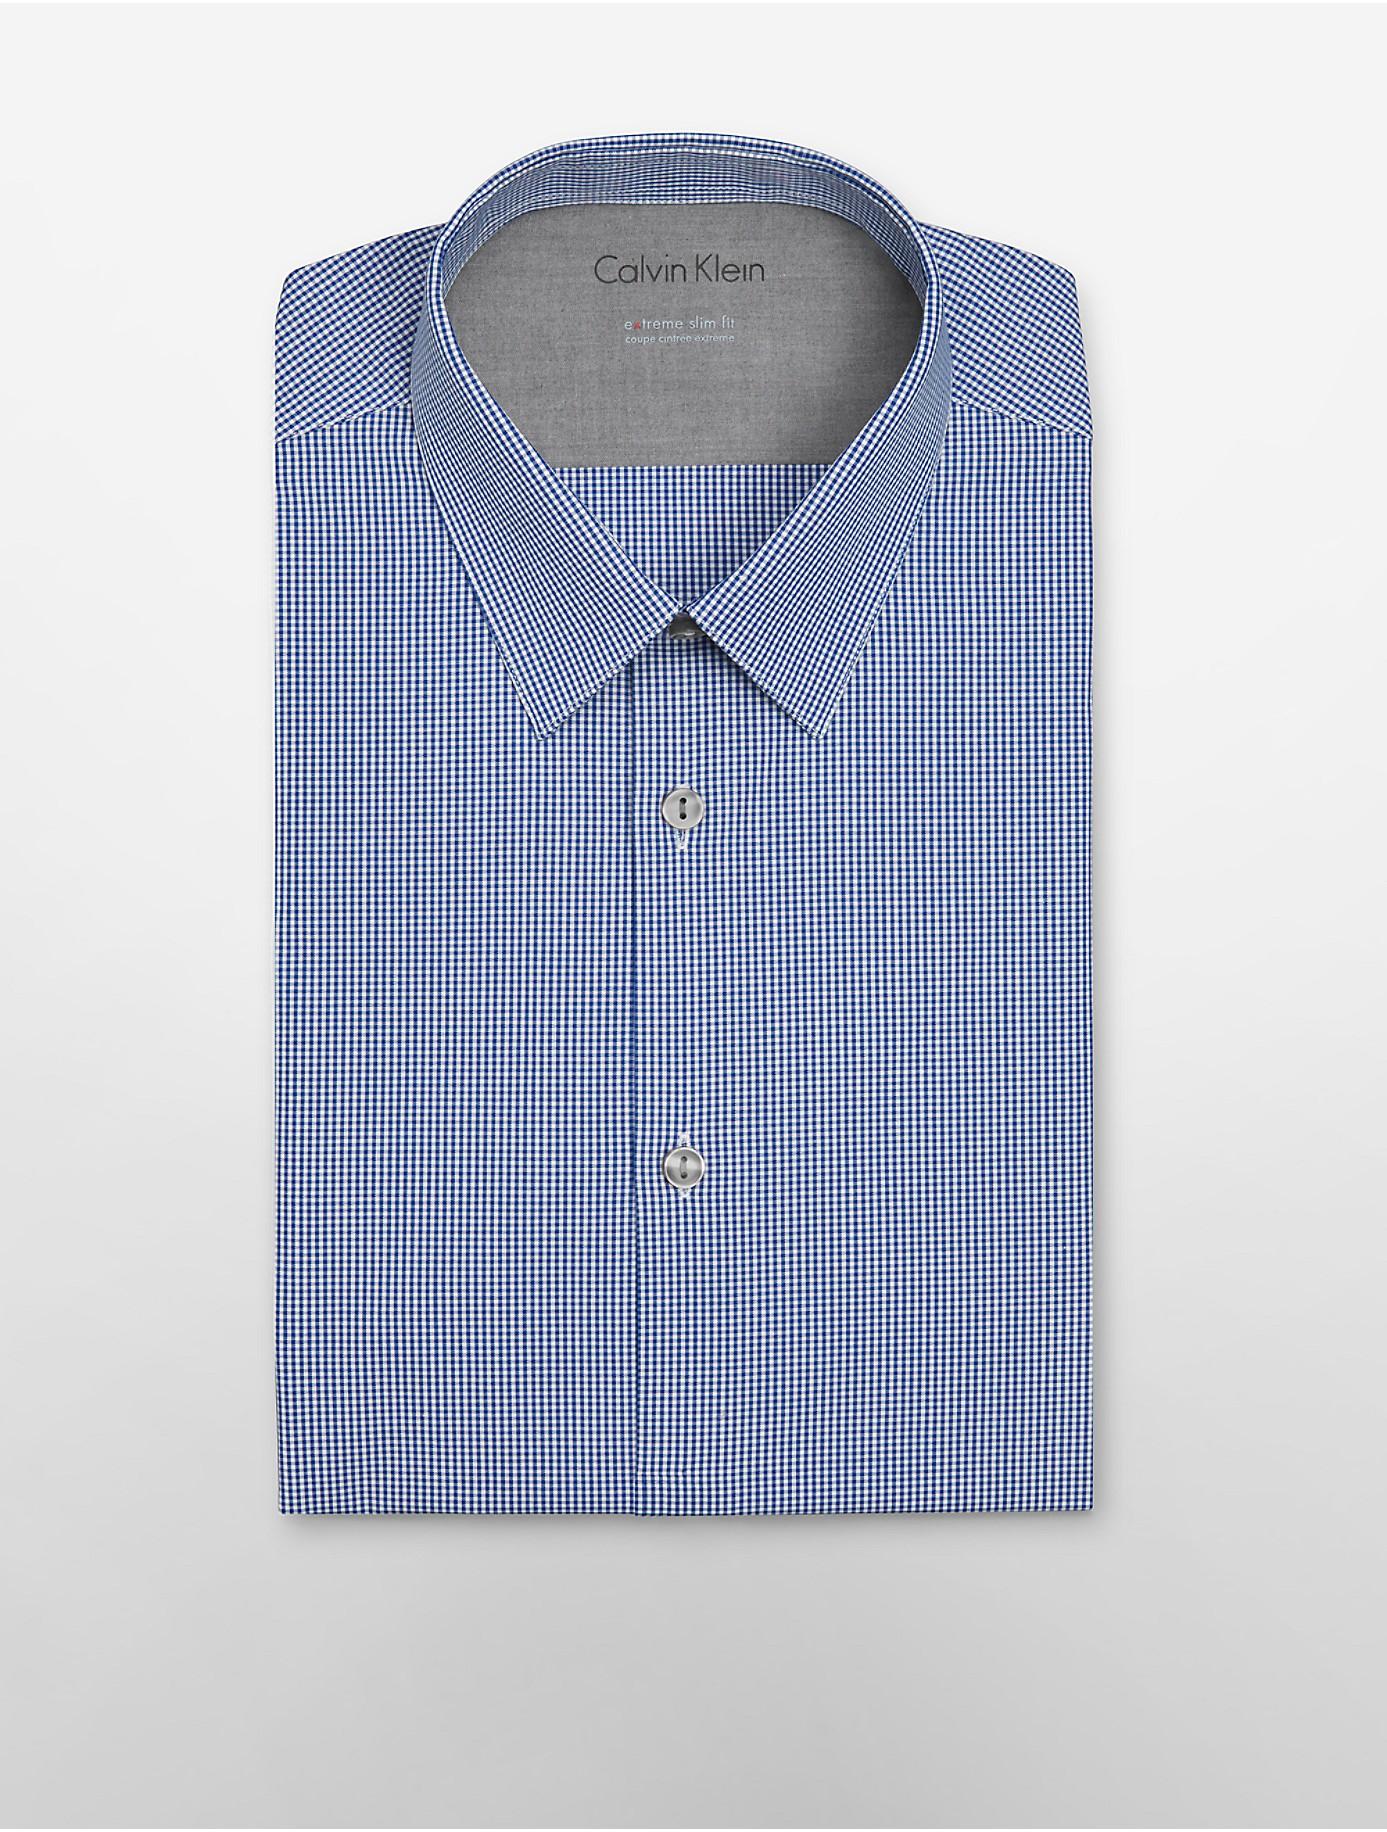 Calvin klein white label x fit ultra slim fit mini check for Calvin klein x fit dress shirt